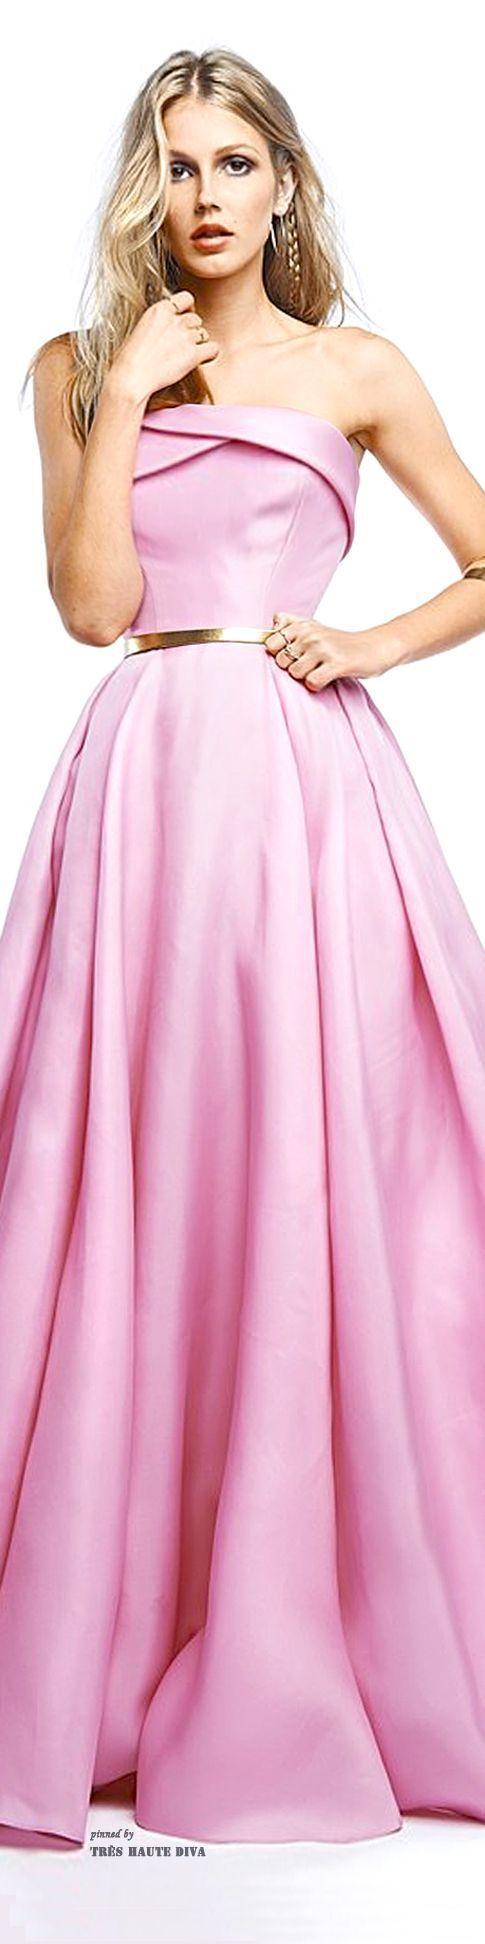 Mejores 260 imágenes de Gala Dresses en Pinterest | Vestidos bonitos ...